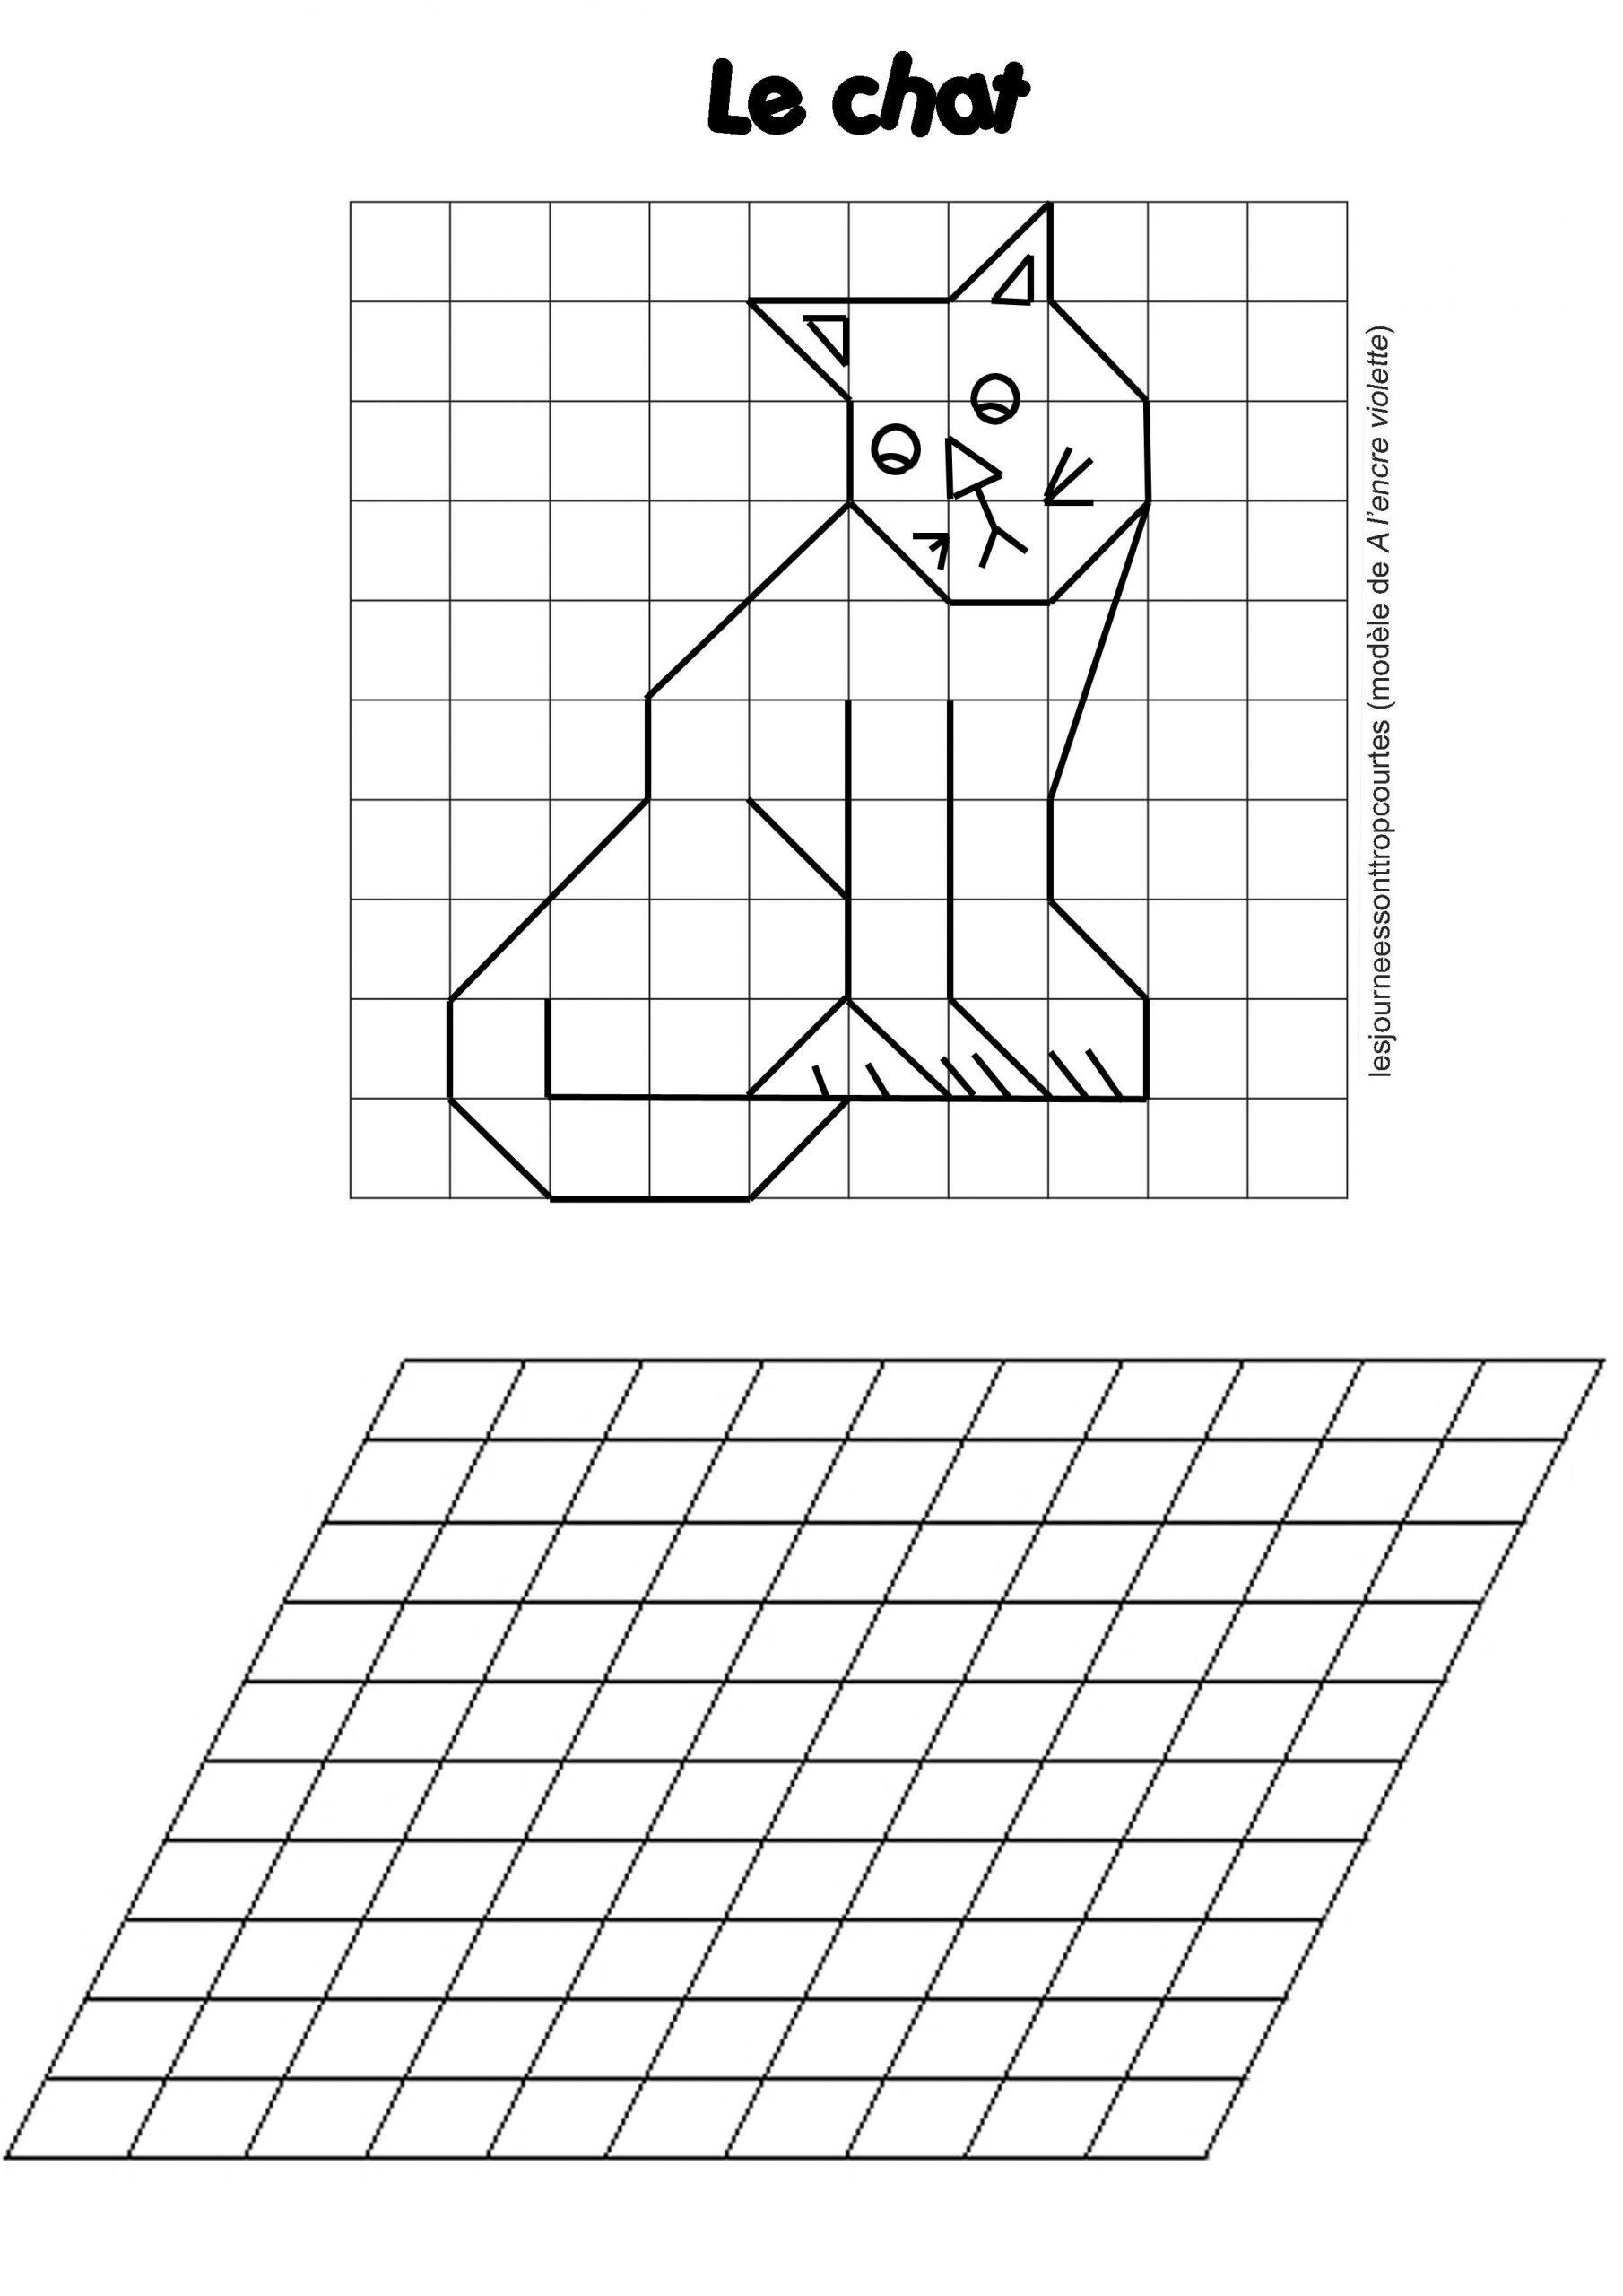 Reproduction De Figures   Dessin Quadrillage, Quadrillage intérieur Reproduction Sur Quadrillage Cm1 A Imprimer